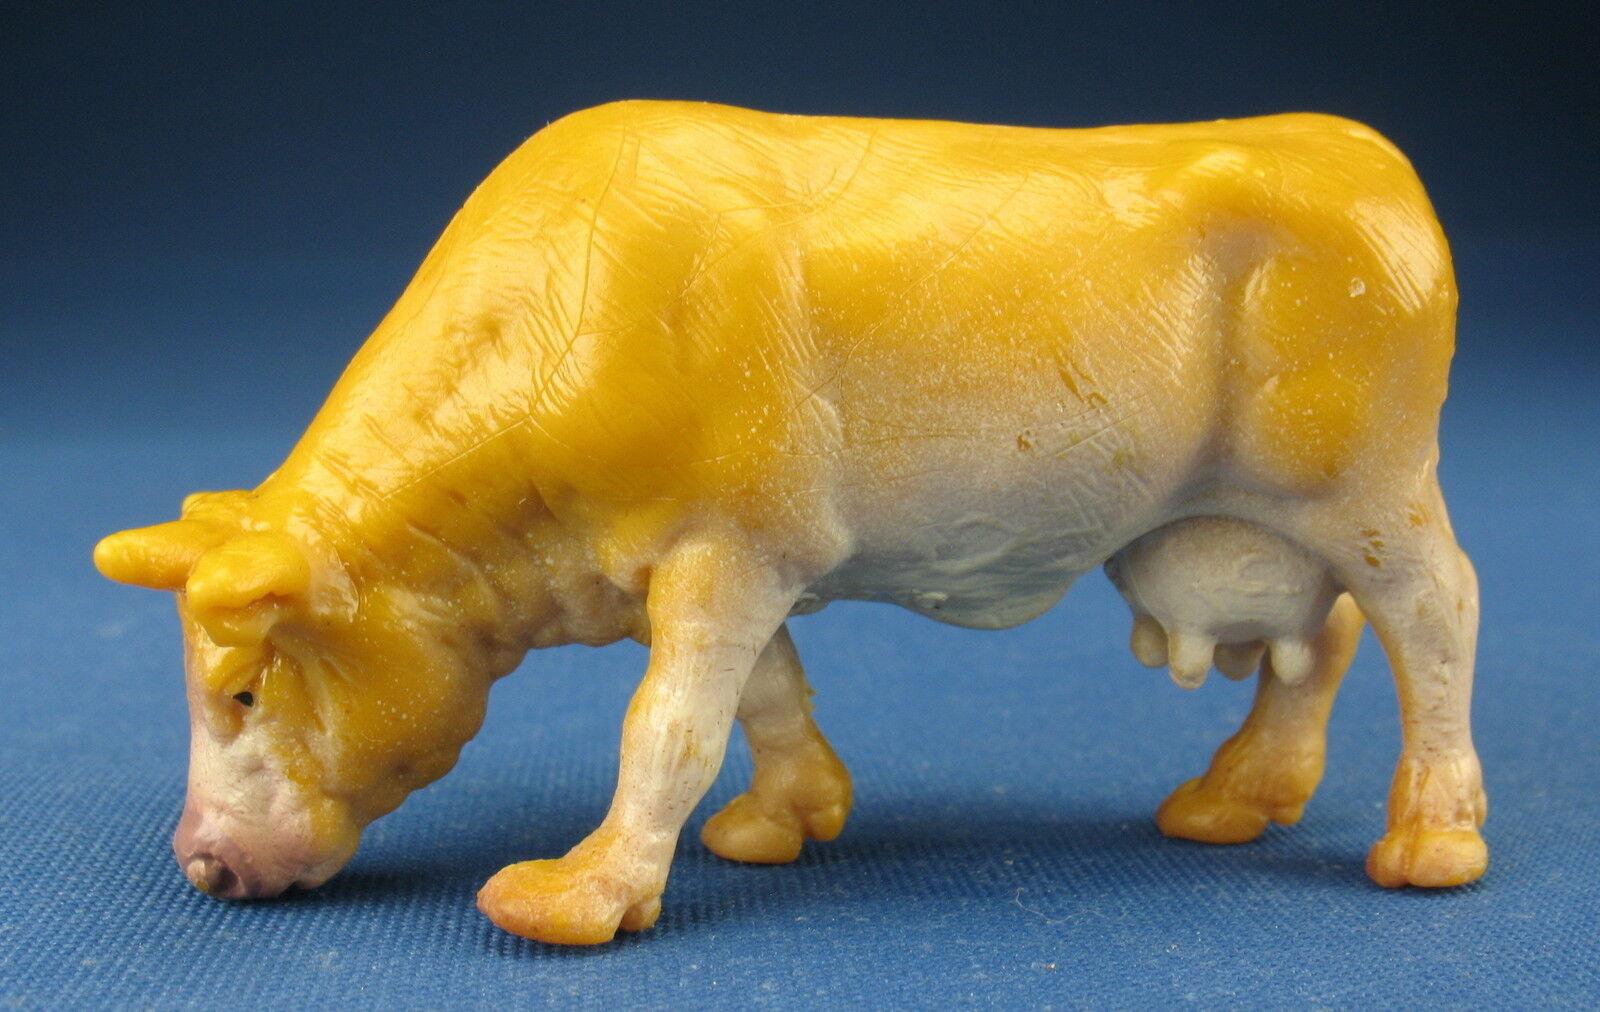 Schleich CLASSICS 12227 - grasende Kuh - Cow grazing - Classic - Bauernhof-Tier